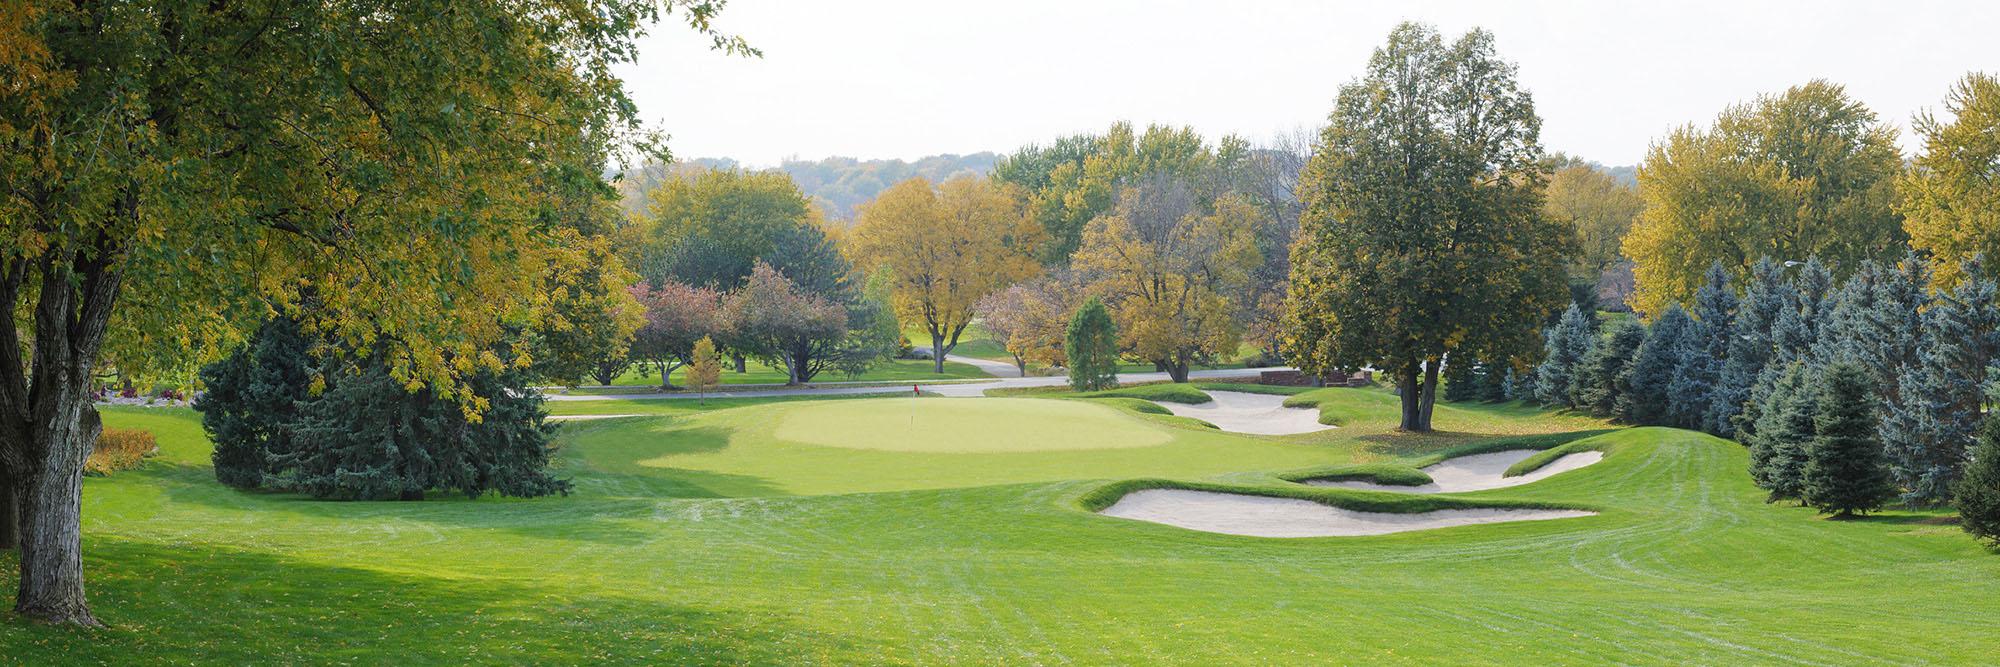 Golf Course Image - Oak Hill No. 9